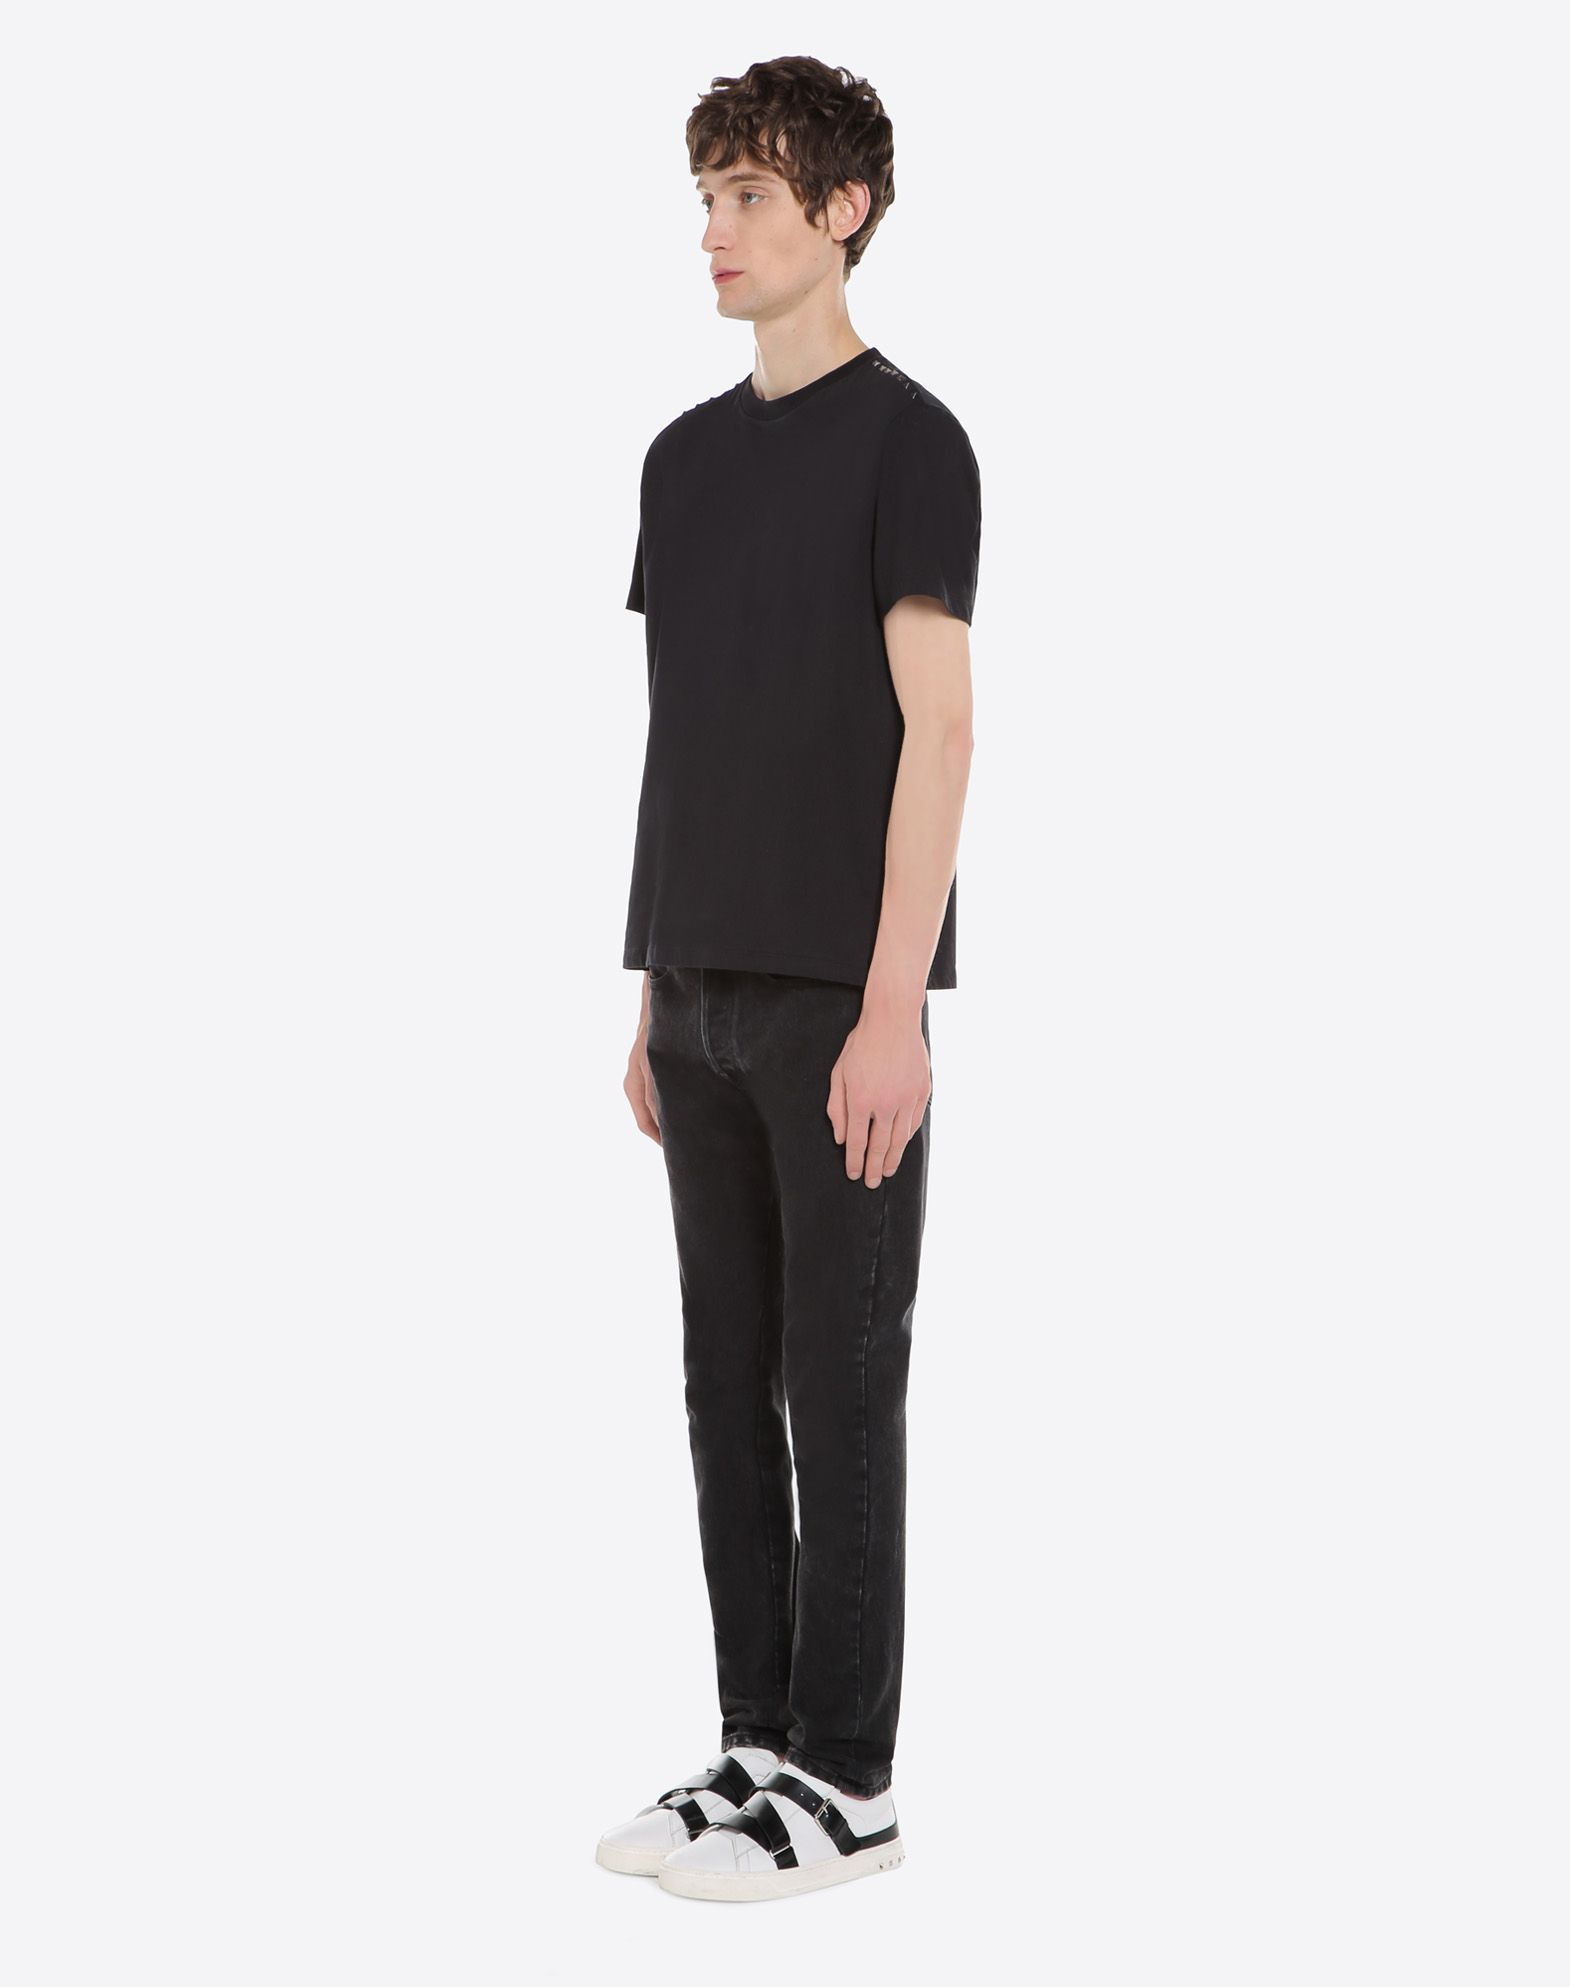 VALENTINO Studs Jersey Round collar Side slit hemline Short sleeves  12026771ll